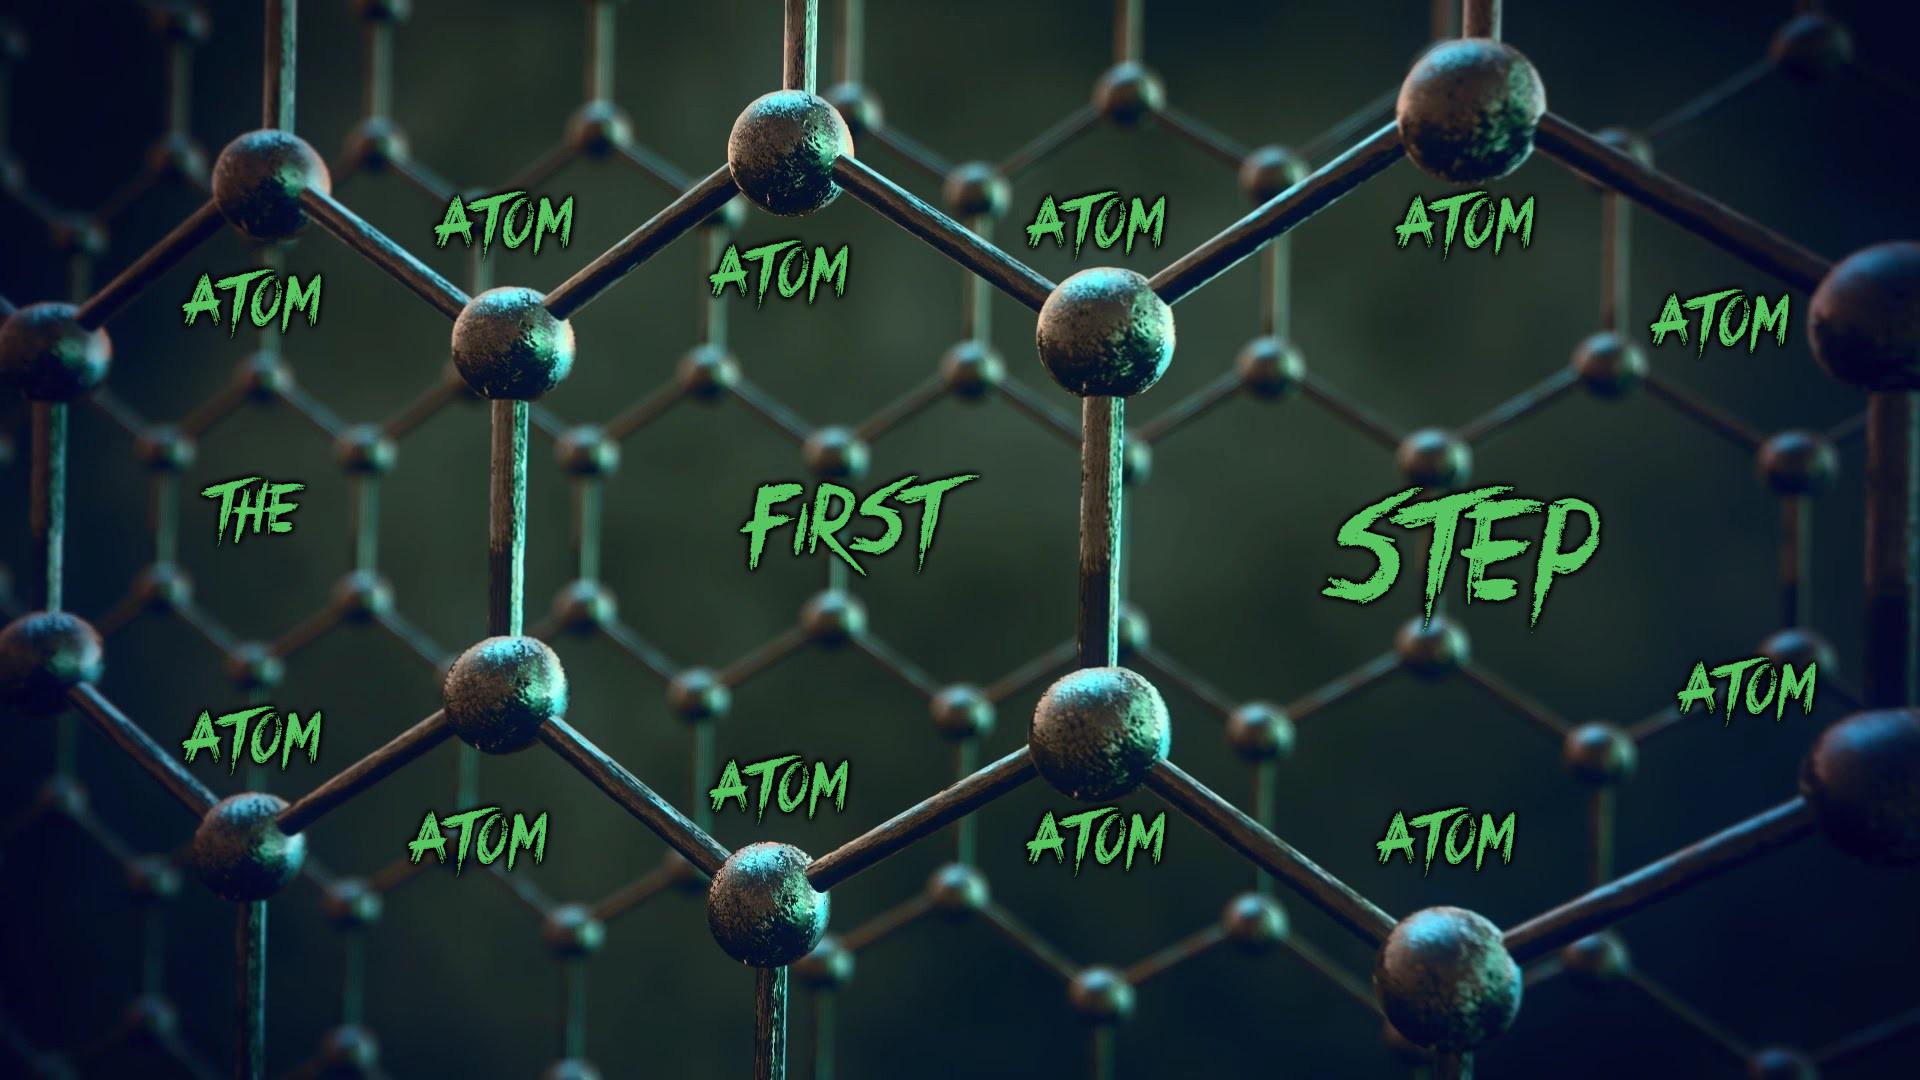 Atom First Step.jpg